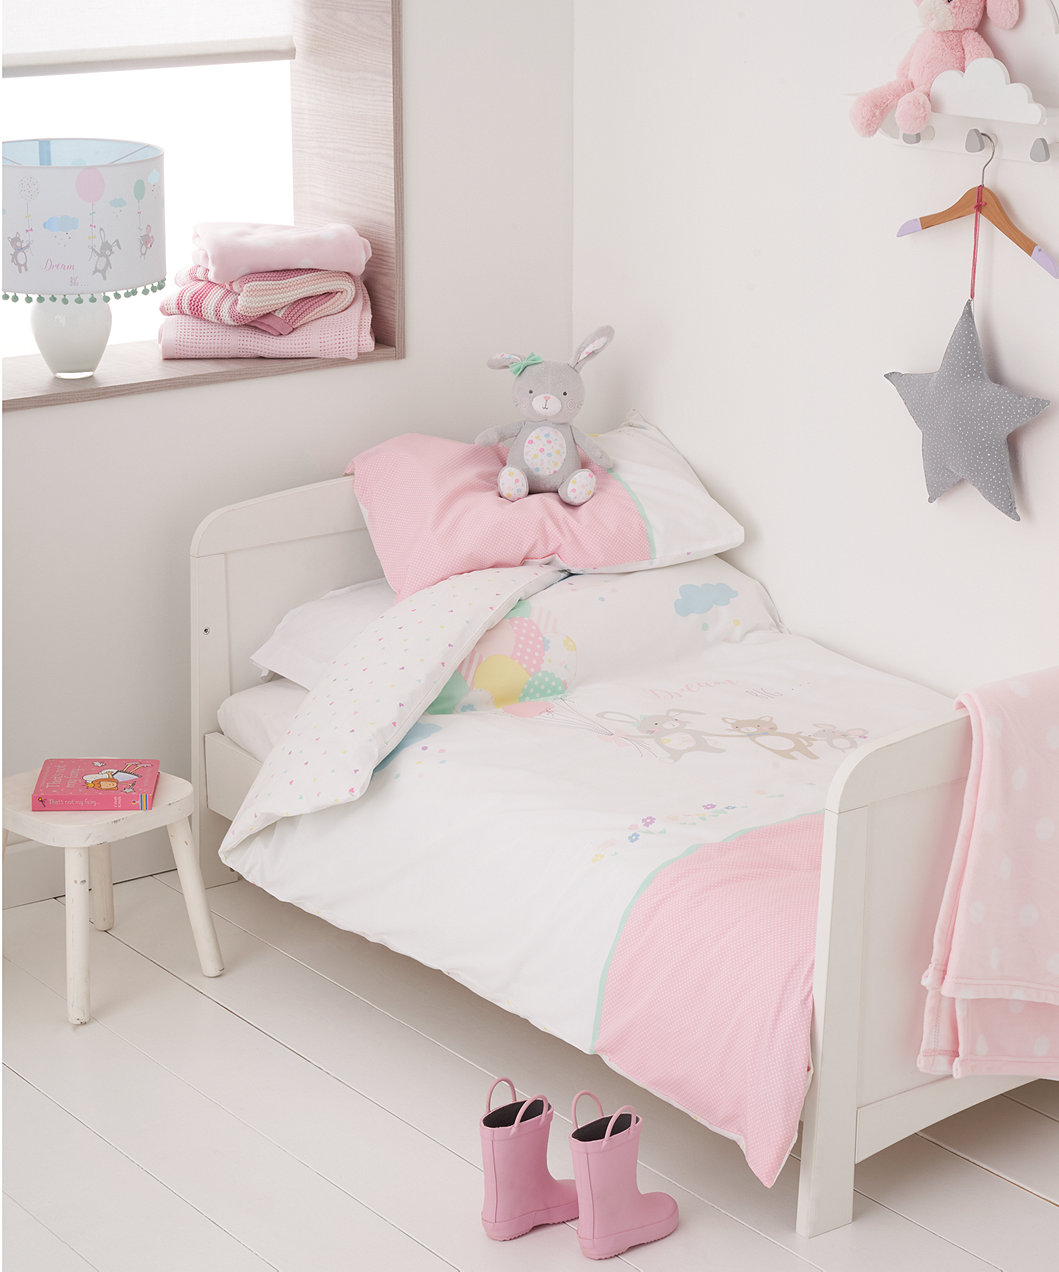 confetti party cot bed duvet set - Комплекти білизни - Постільна ... 8ac0352ec4719